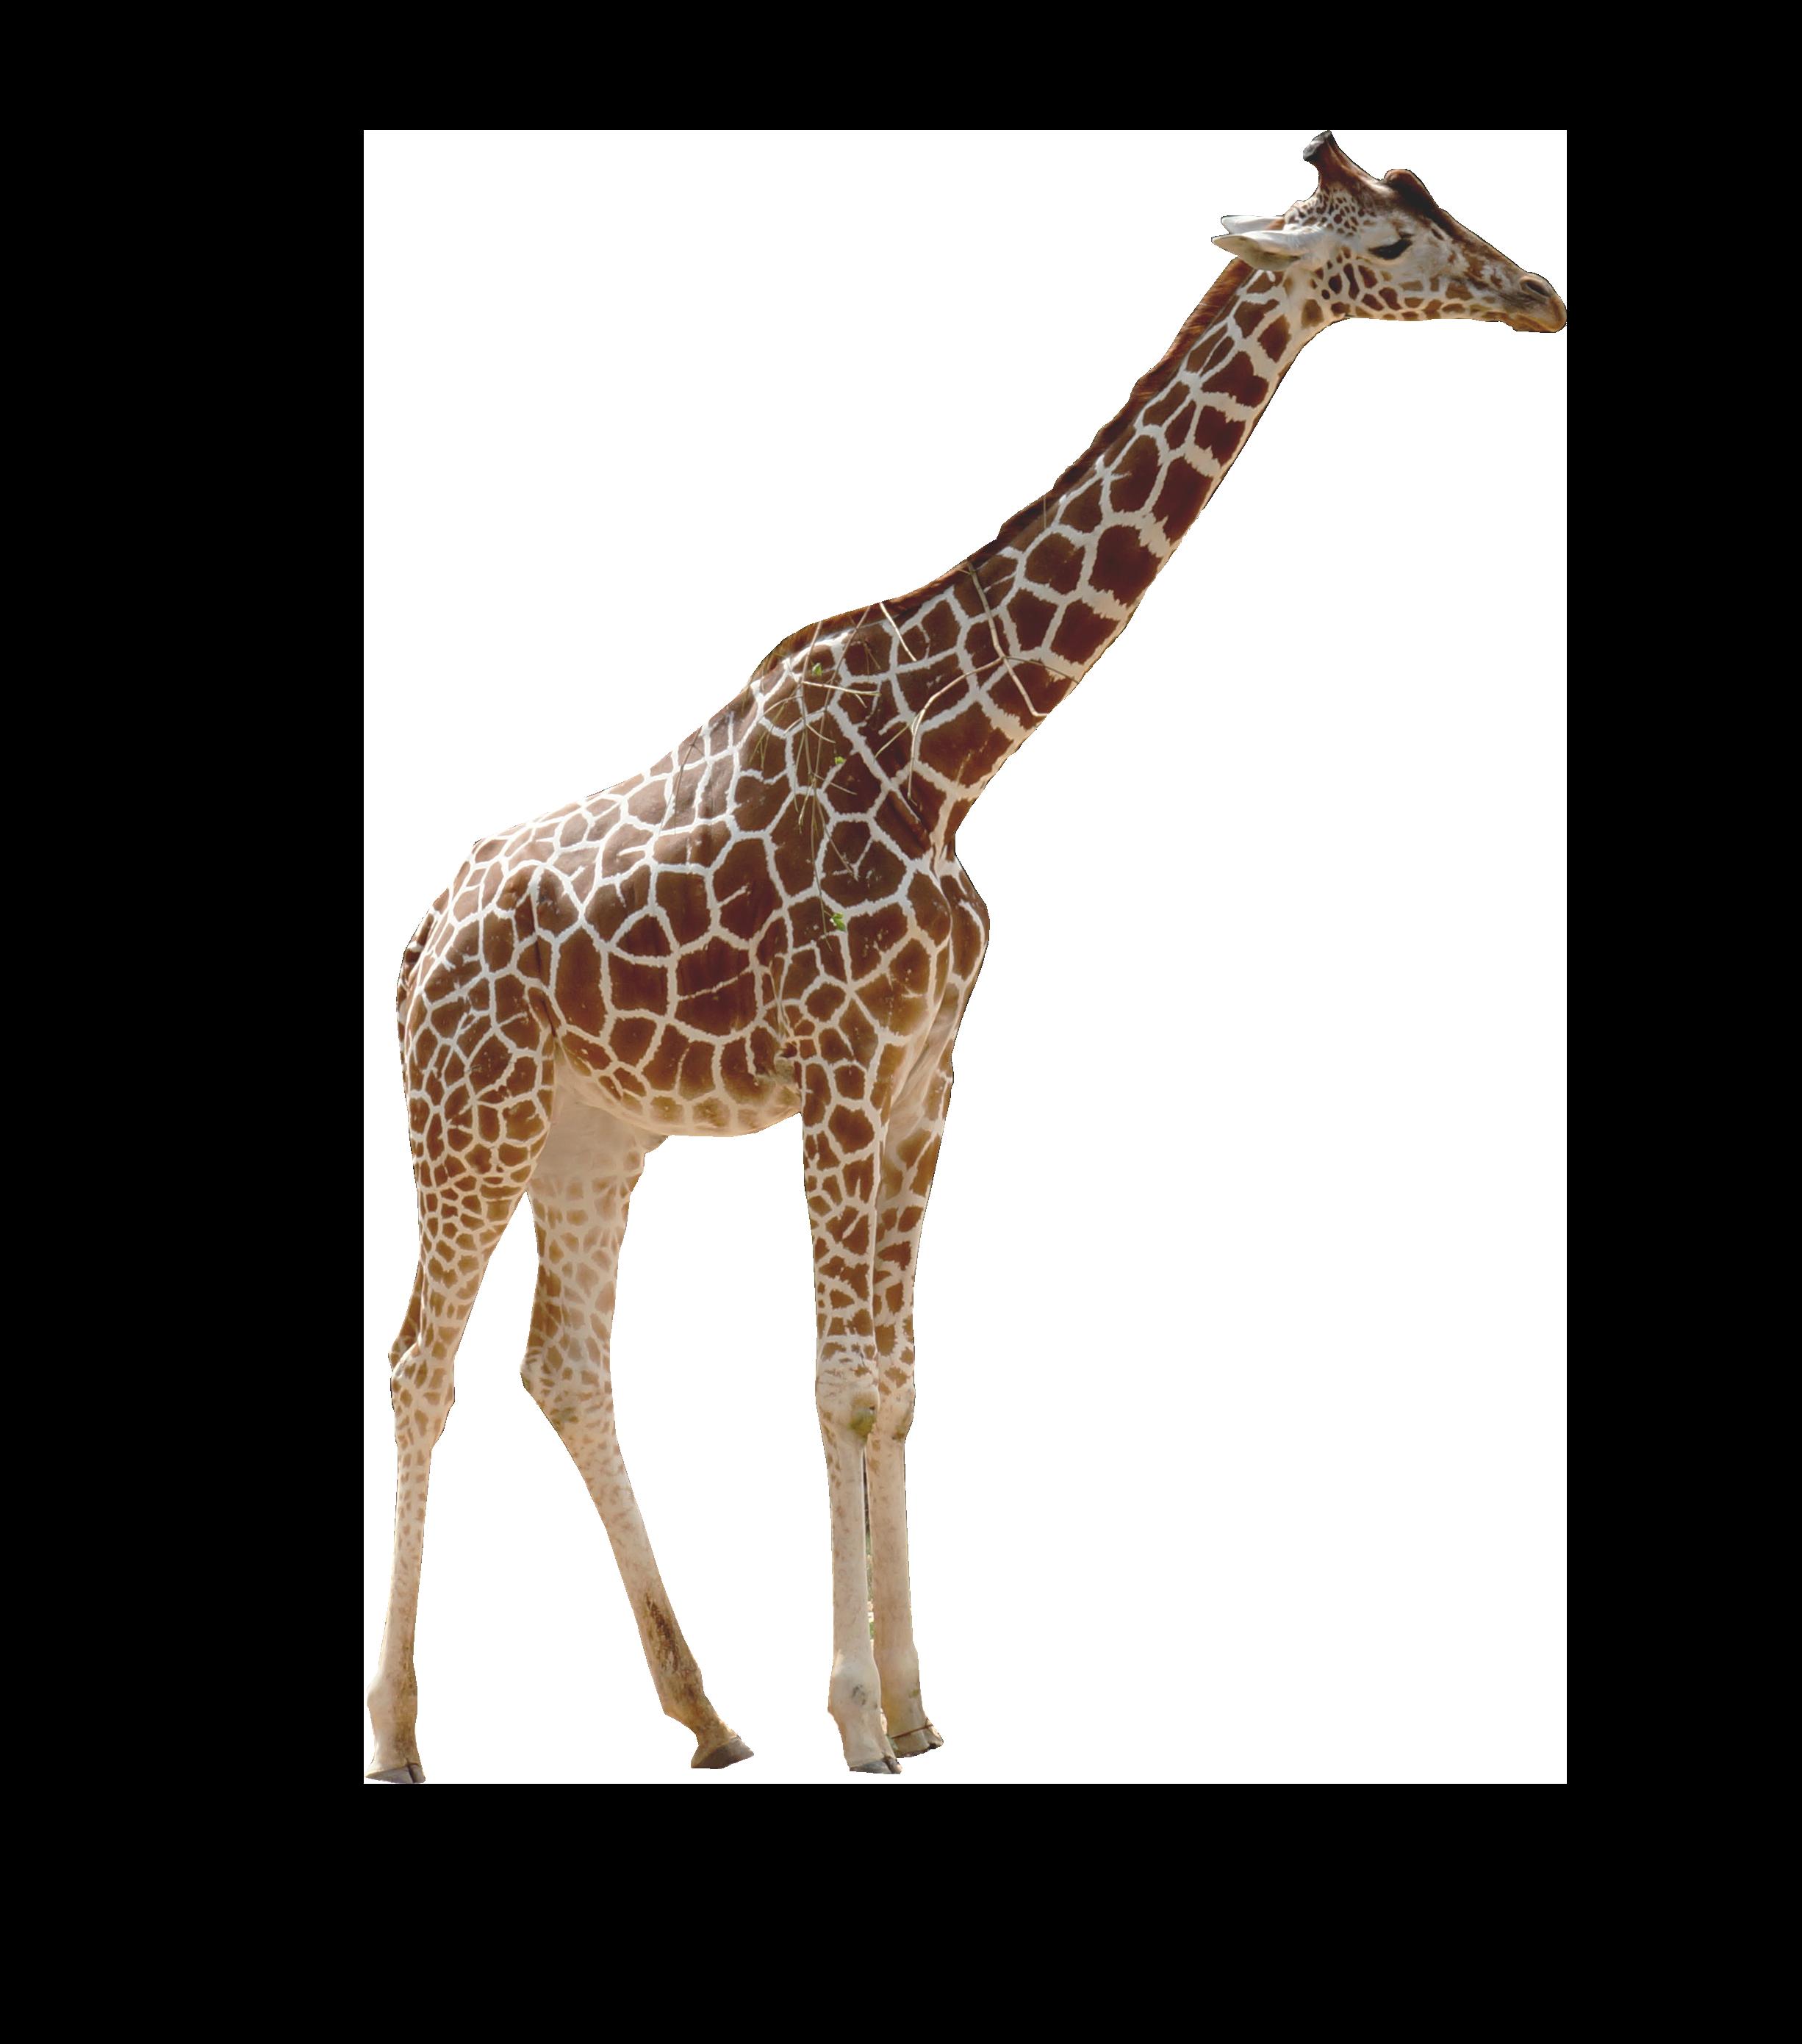 Giraffe PNG Image.